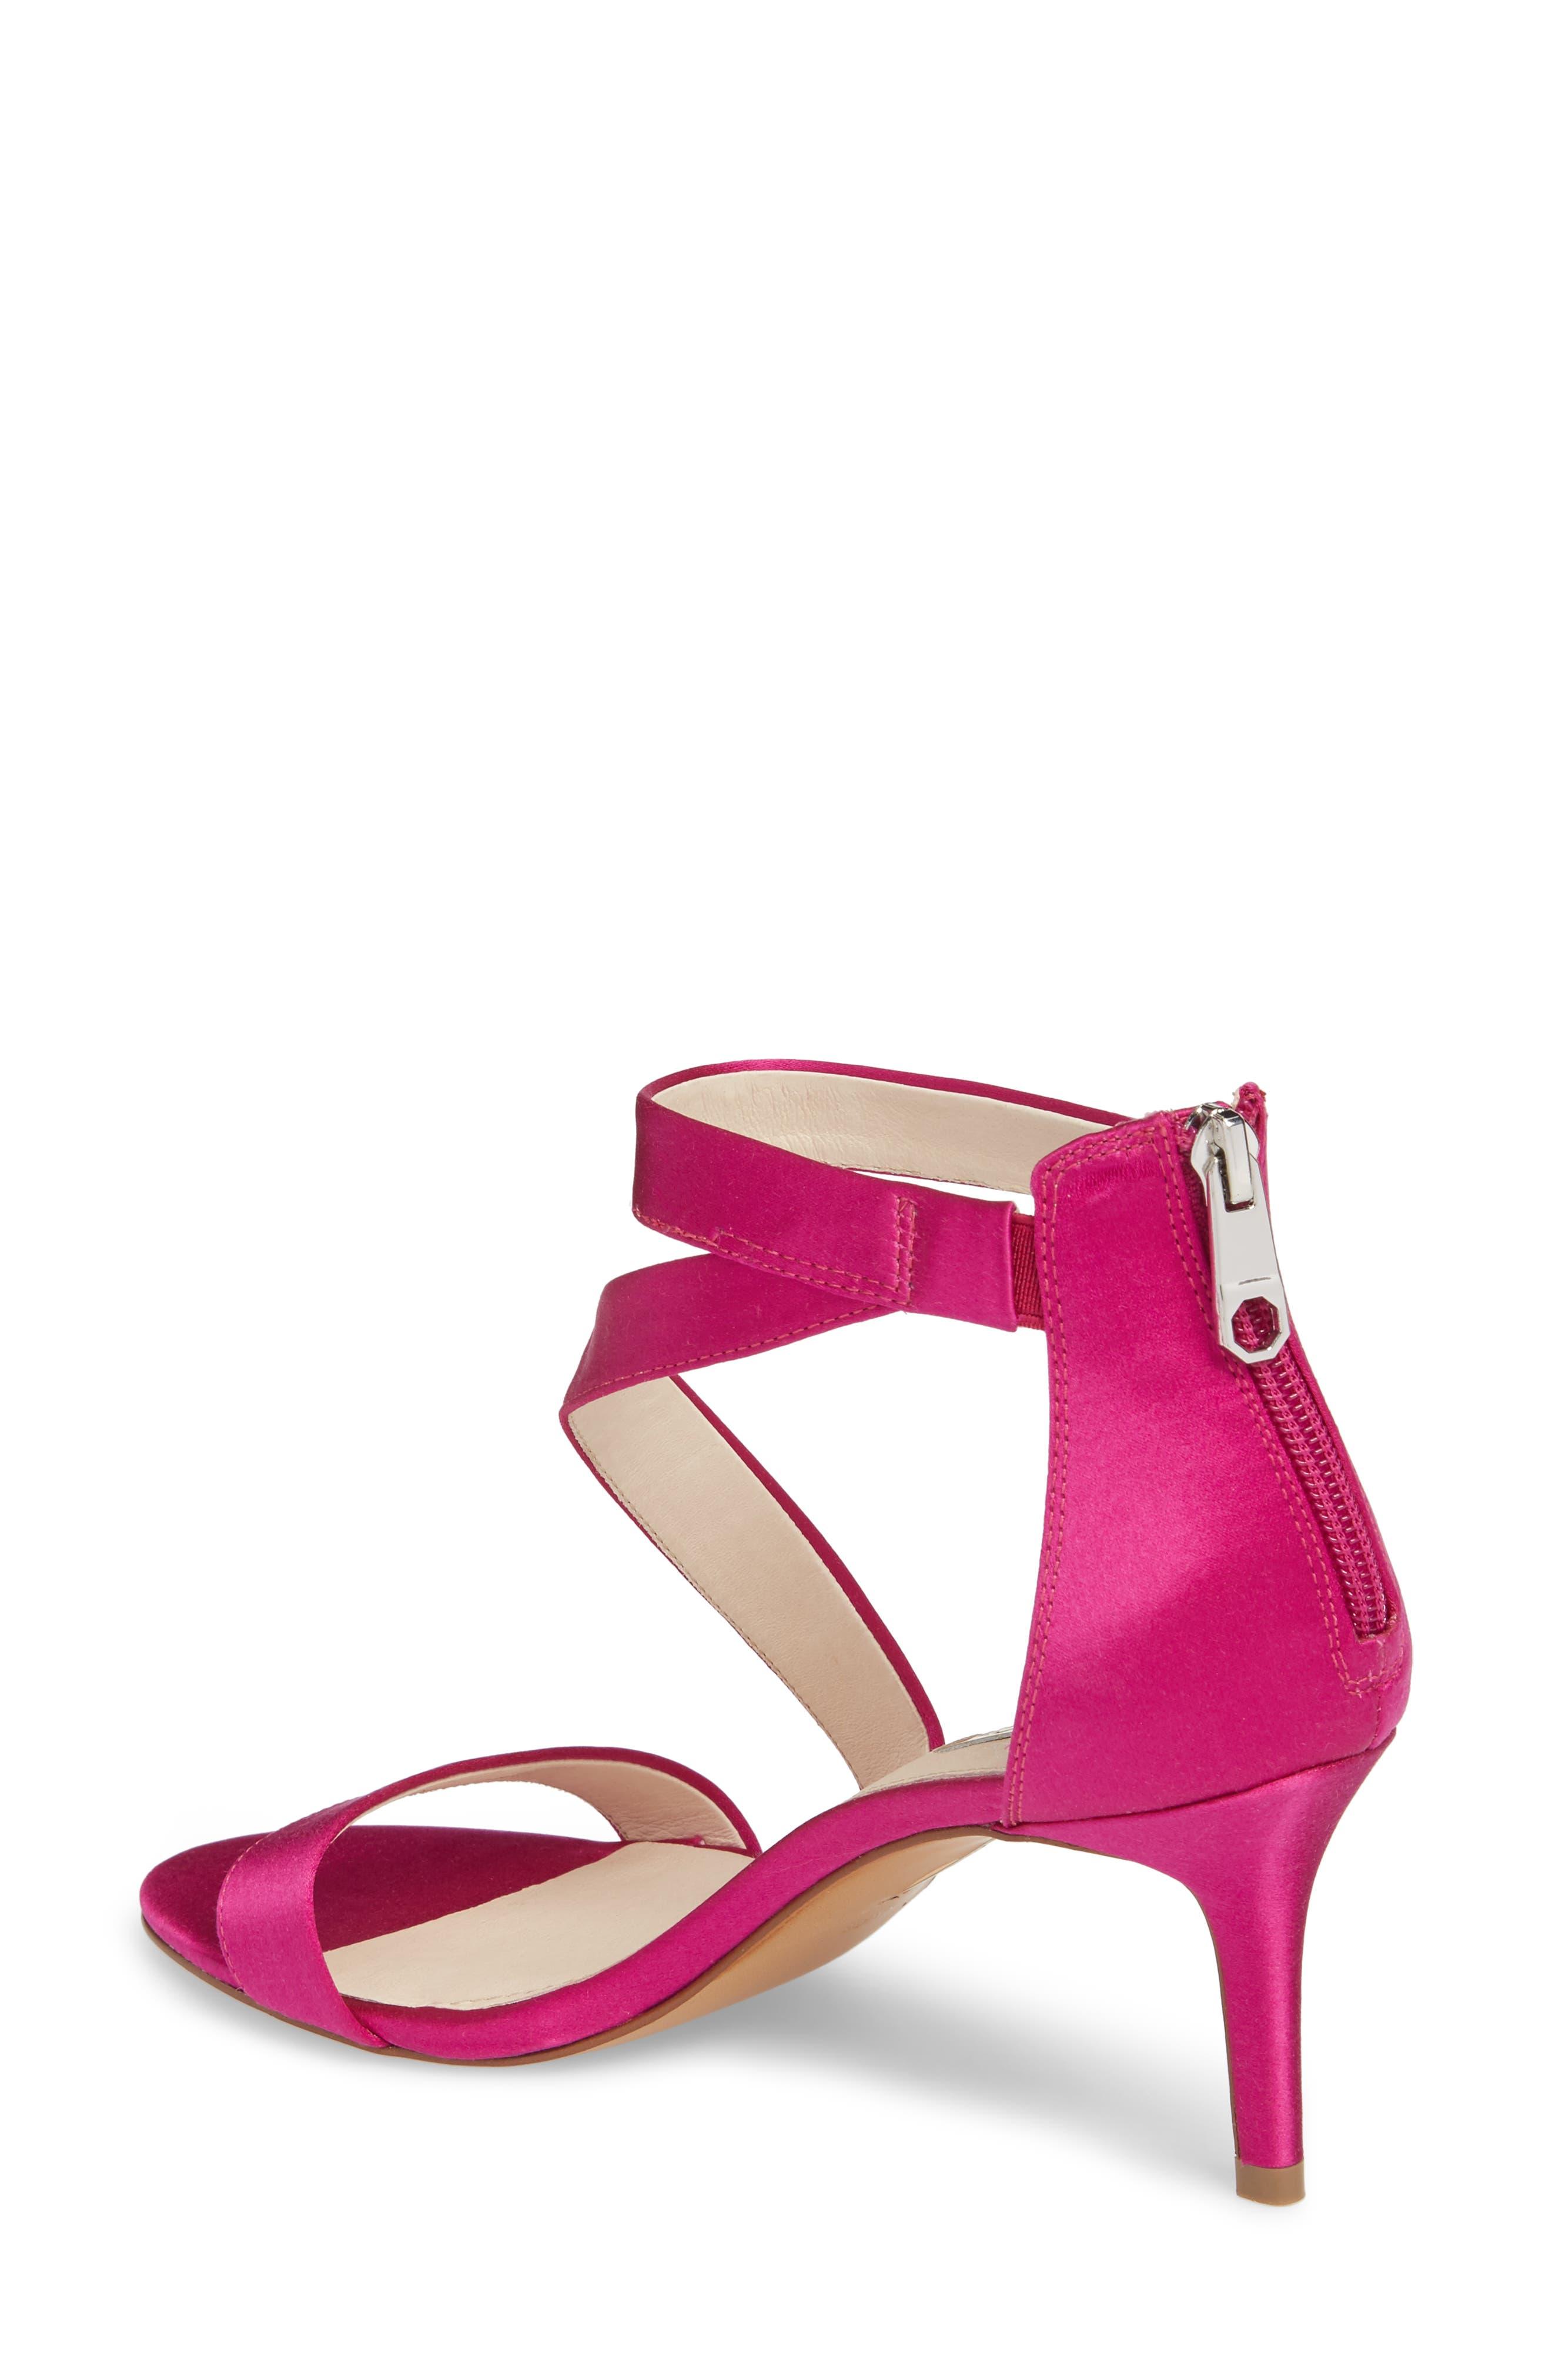 Hilio Sandal,                             Alternate thumbnail 2, color,                             Electric Pink Satin